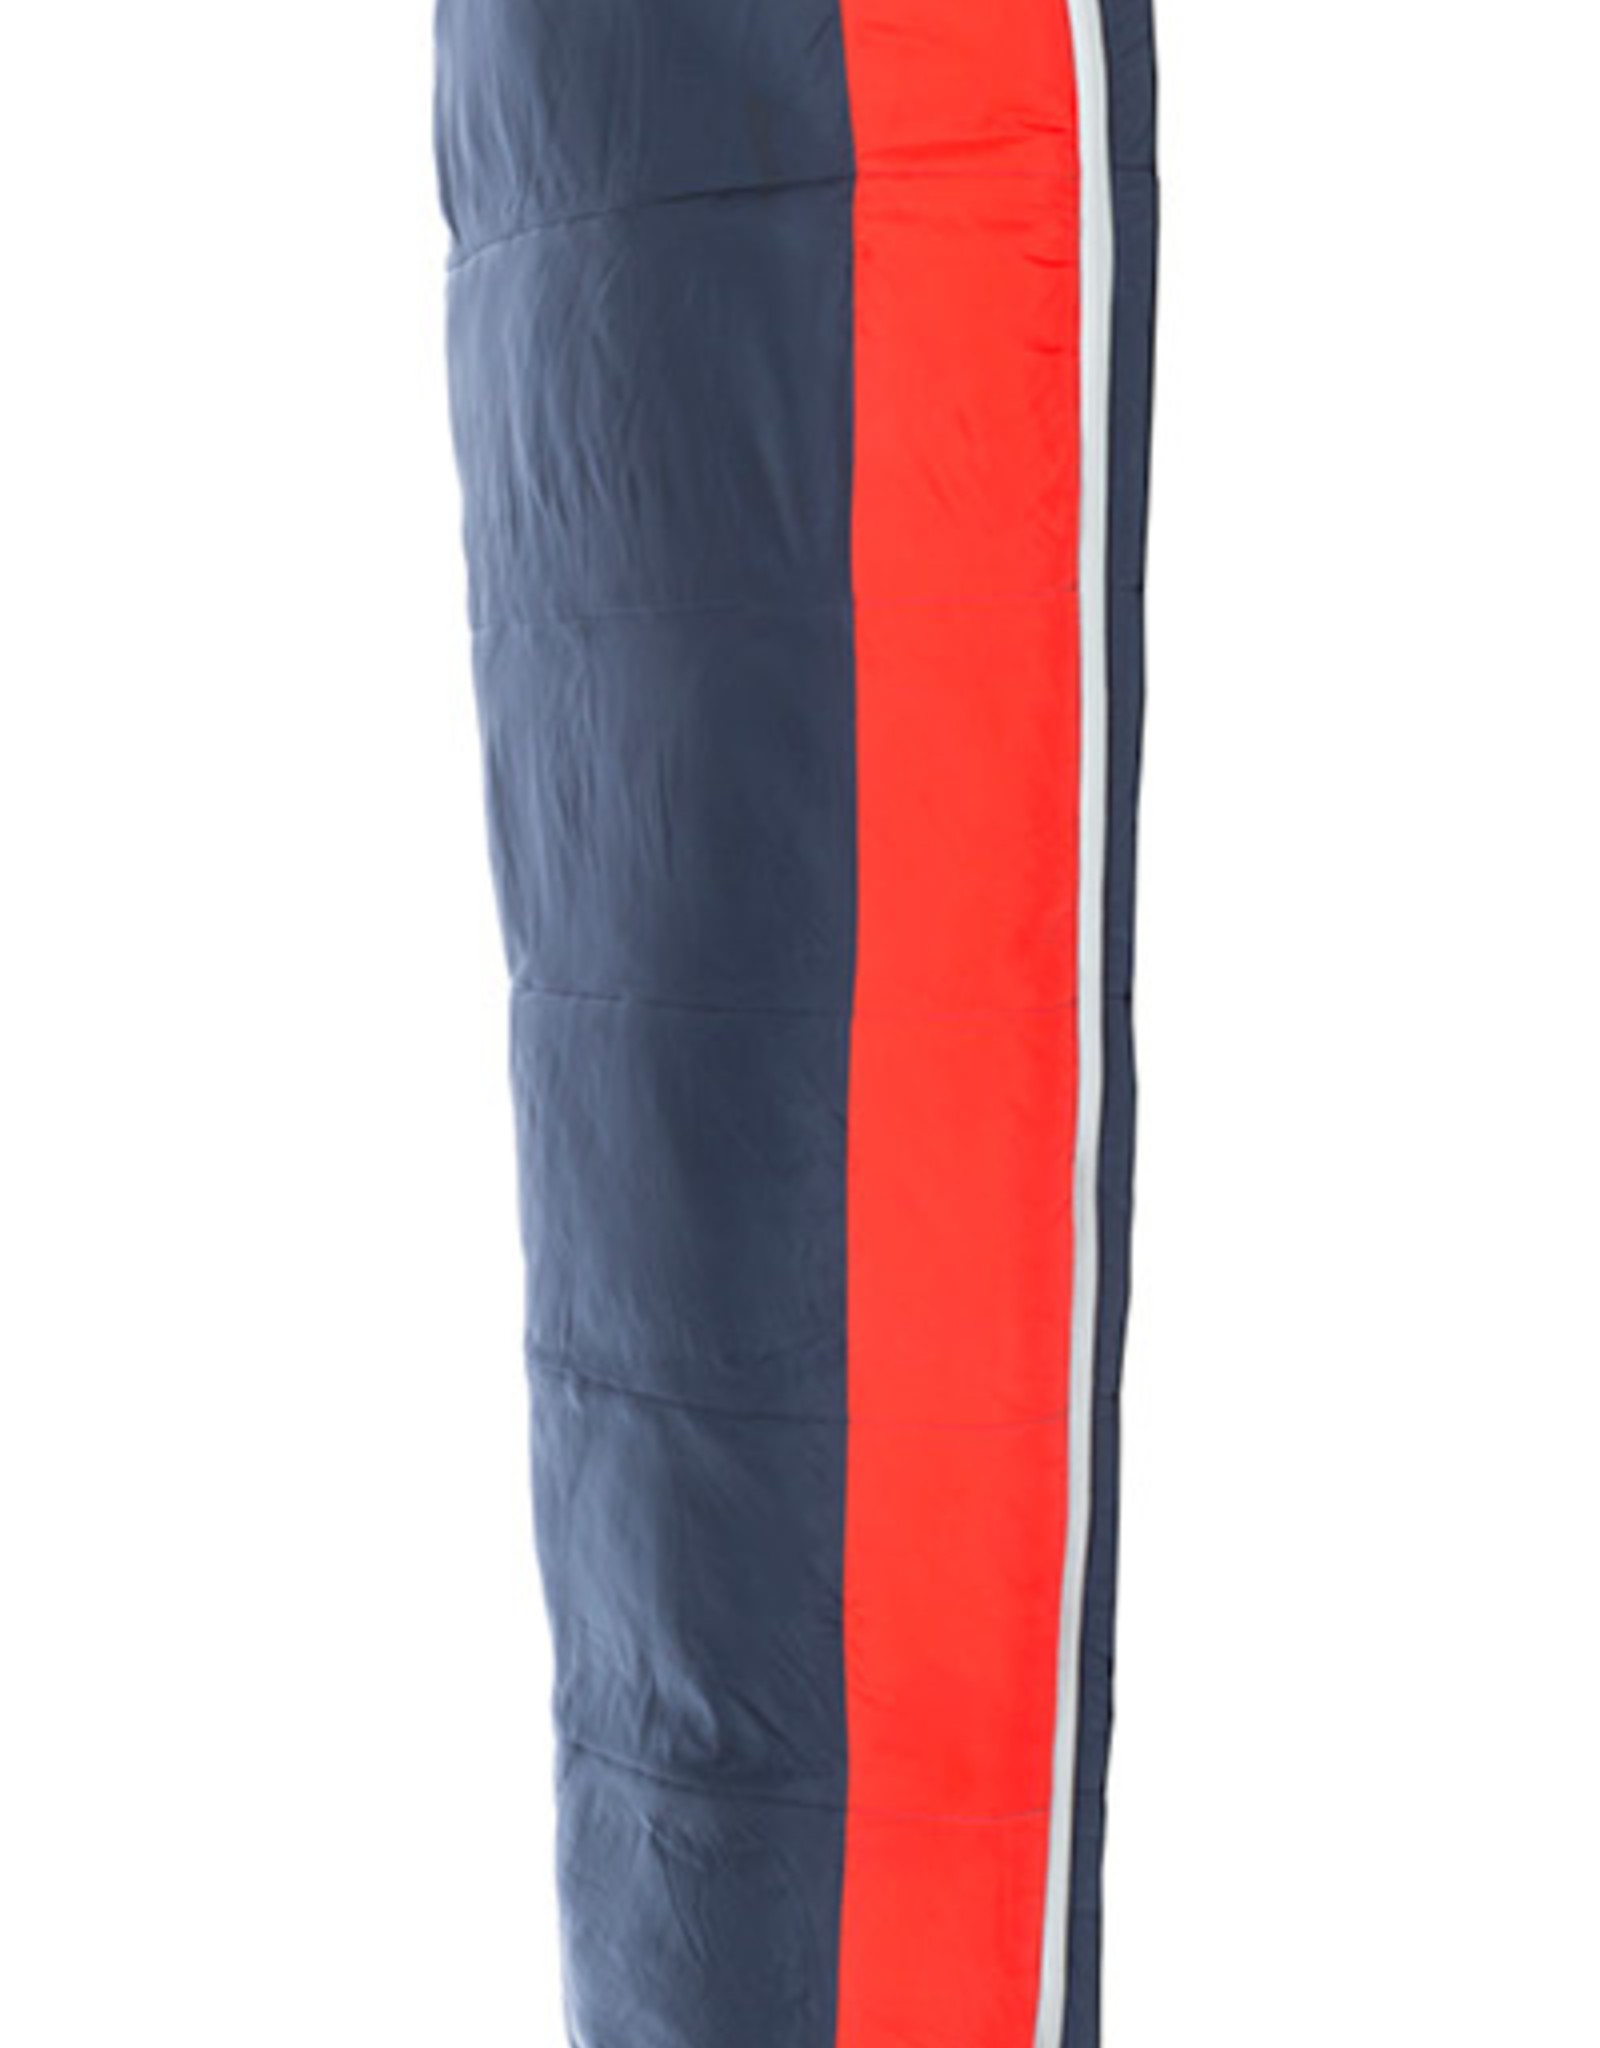 Big Agnes Husted 20 (FireLine Pro) Sleeping Bag Long Left Navy/Red